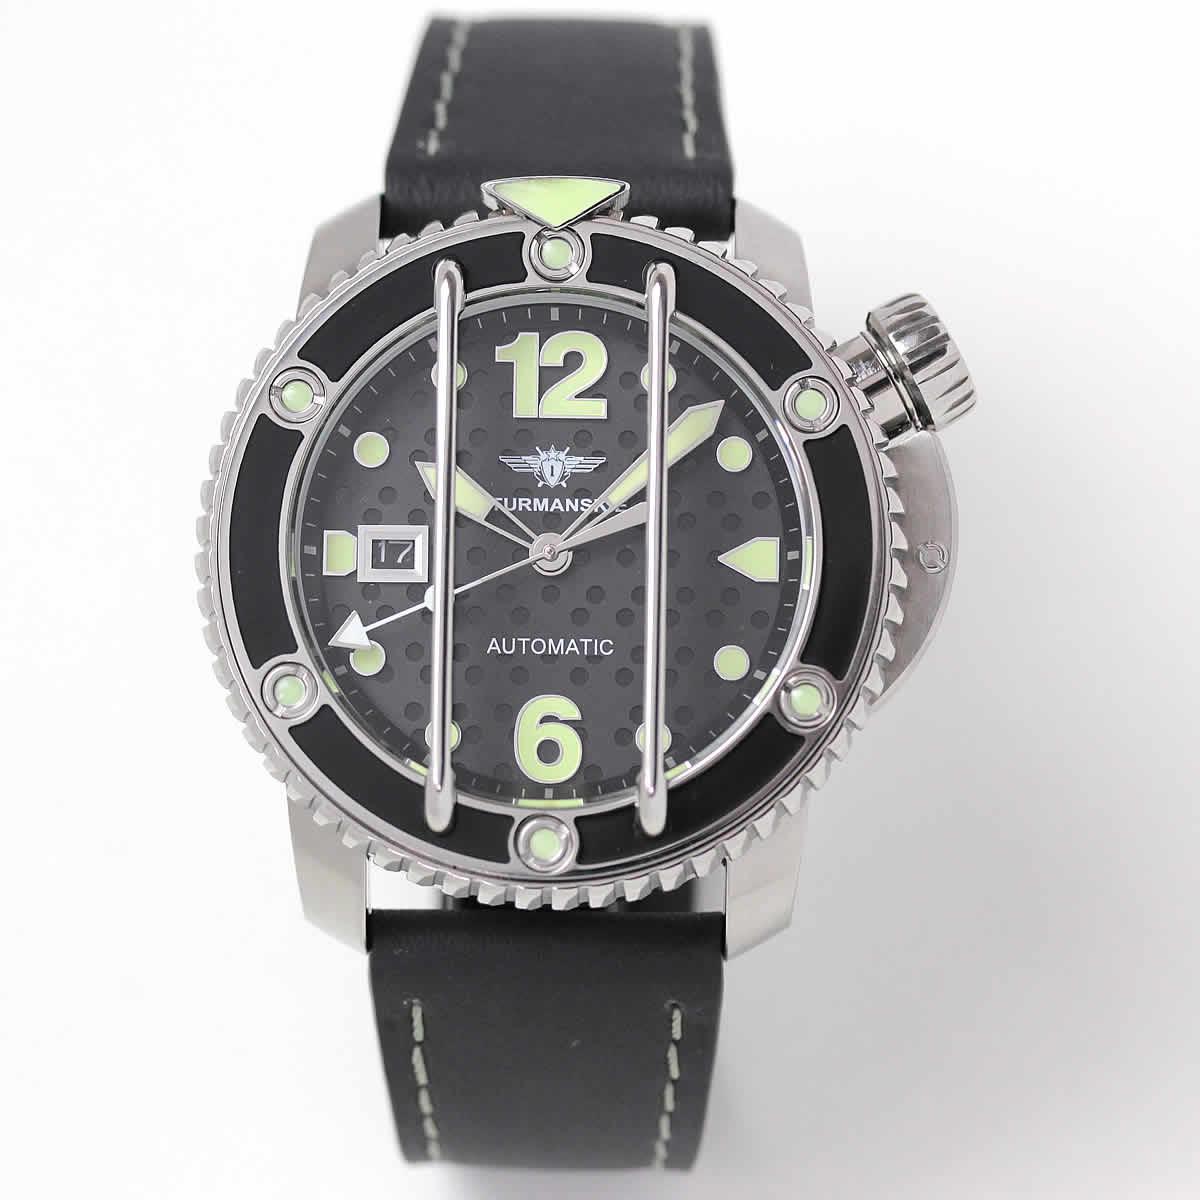 STRUMANSKIE(シュトルマンスキー)Ocean STINGRAY(スティングレイ)腕時計 NH35/1825895 ブラック